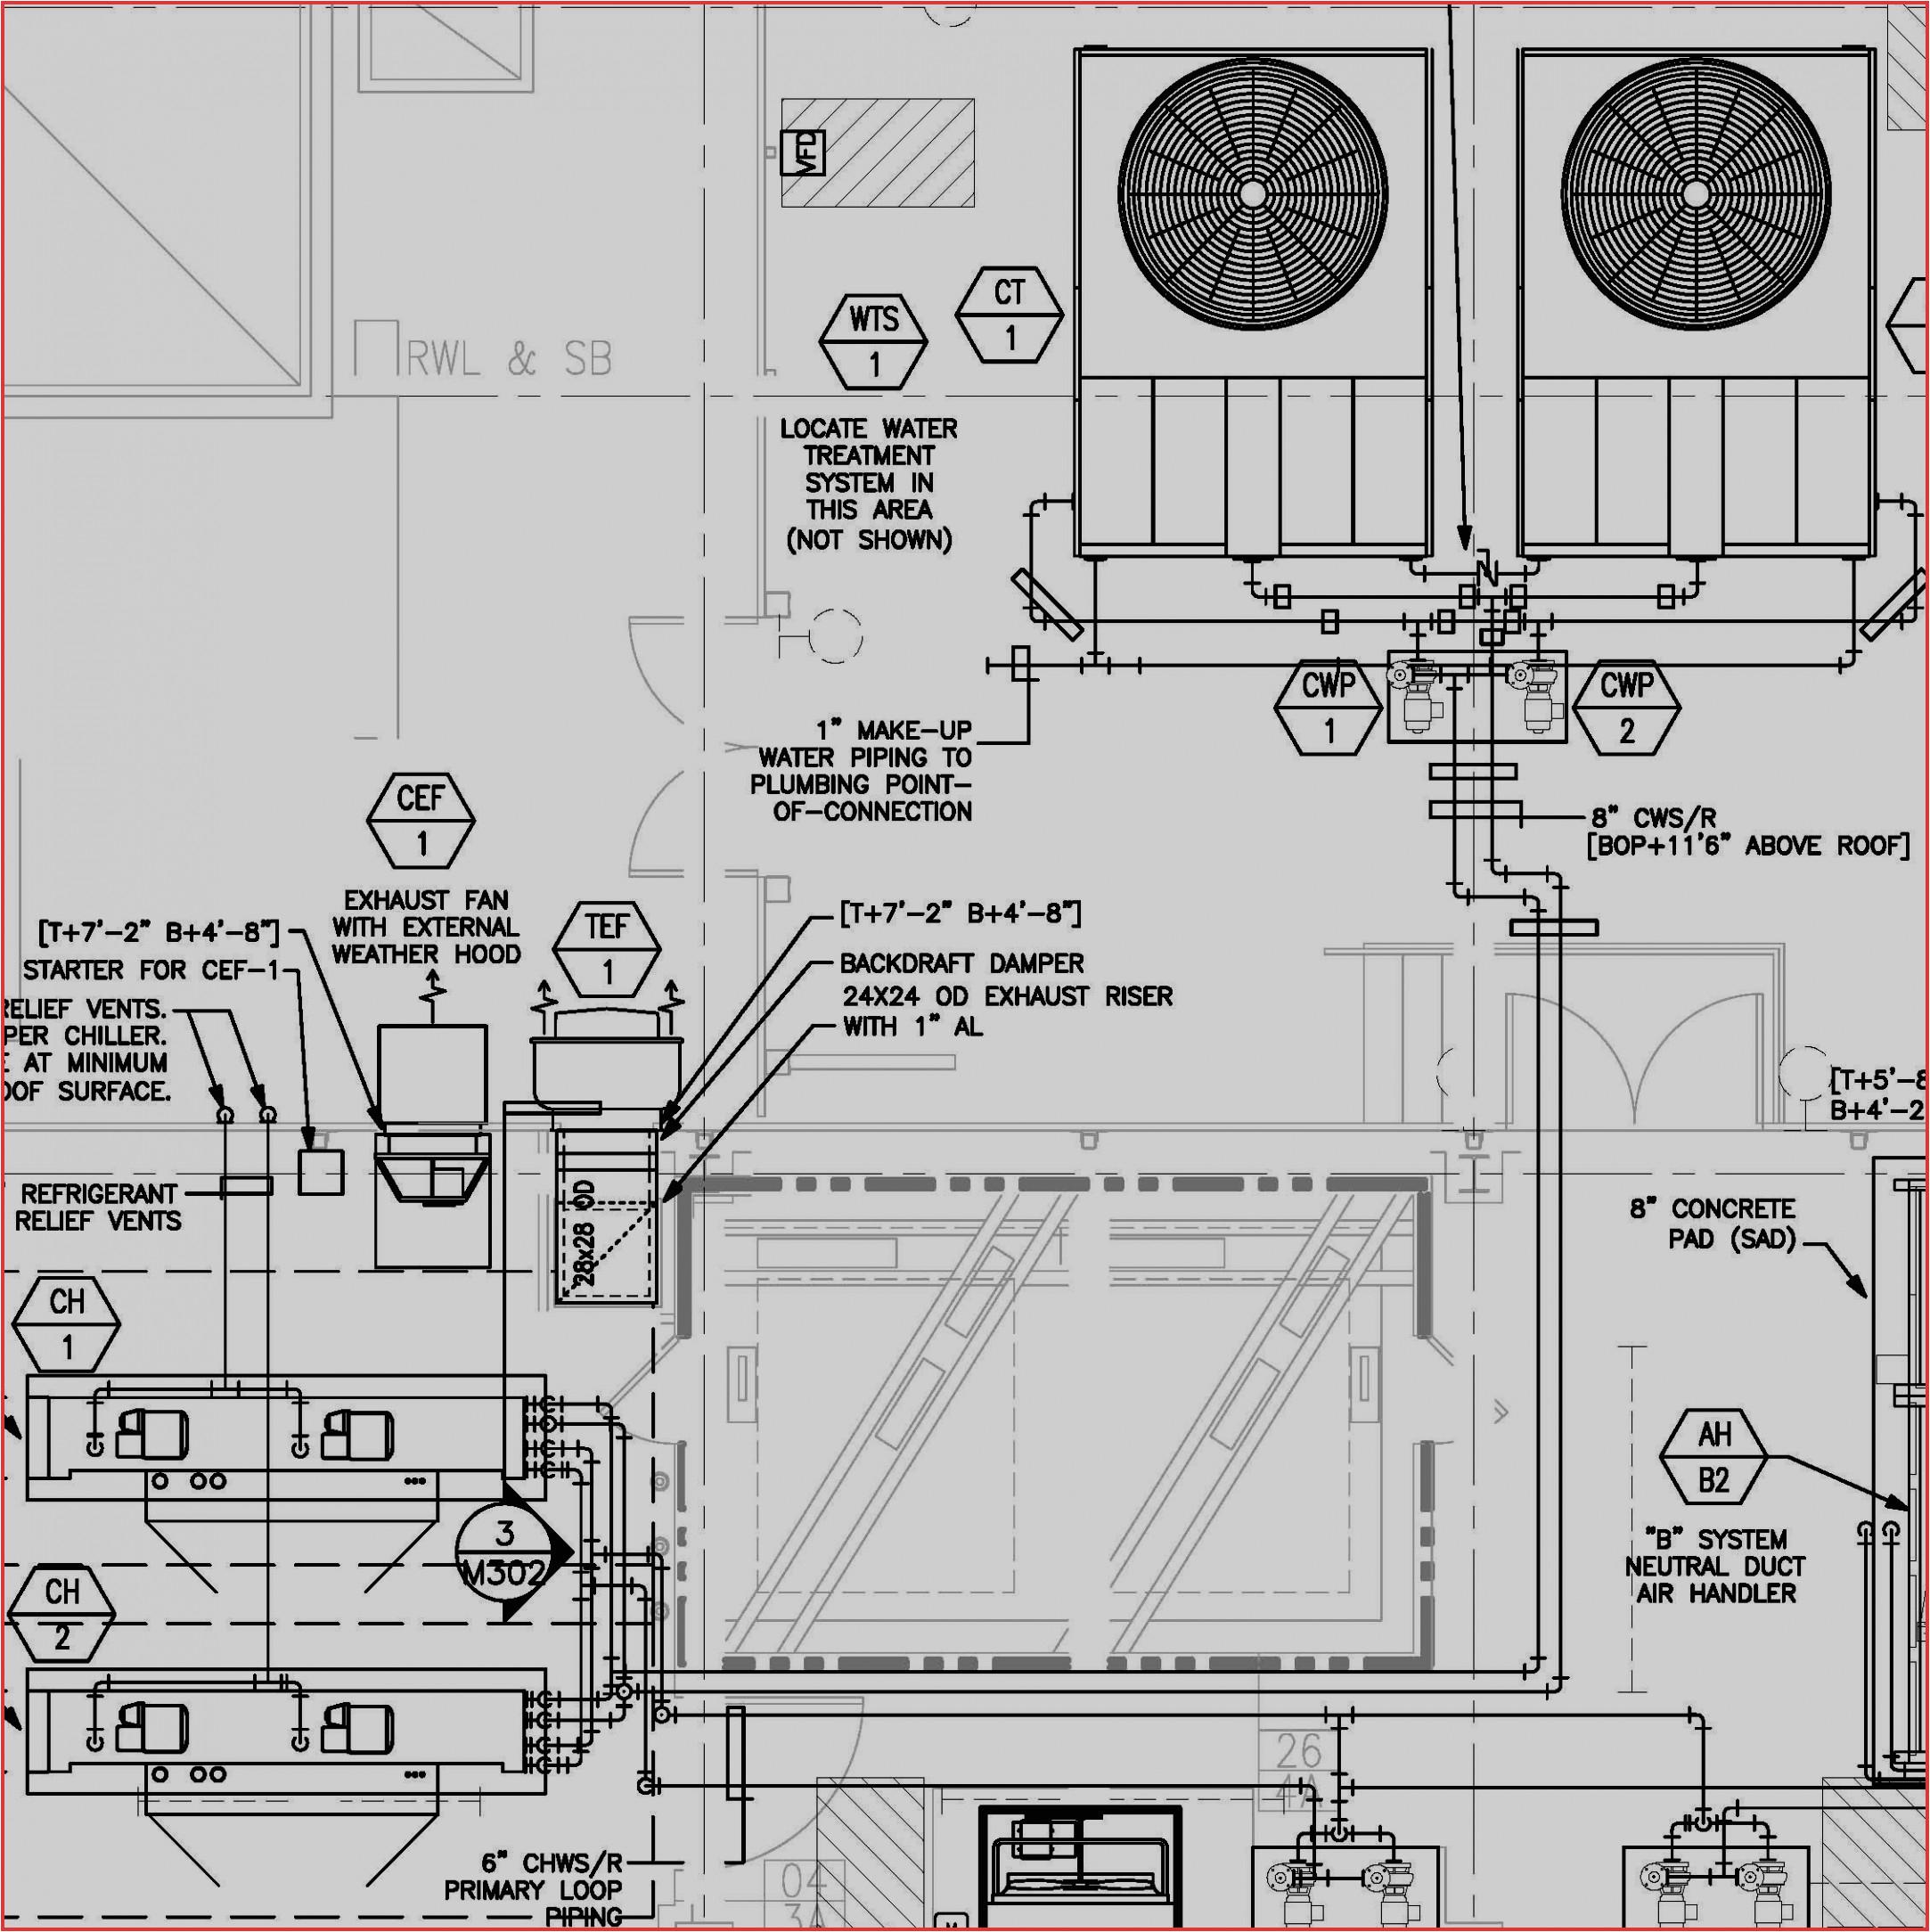 isuzu 2 8 wiring diagram wiring diagram for you isuzu 2 8 wiring diagram